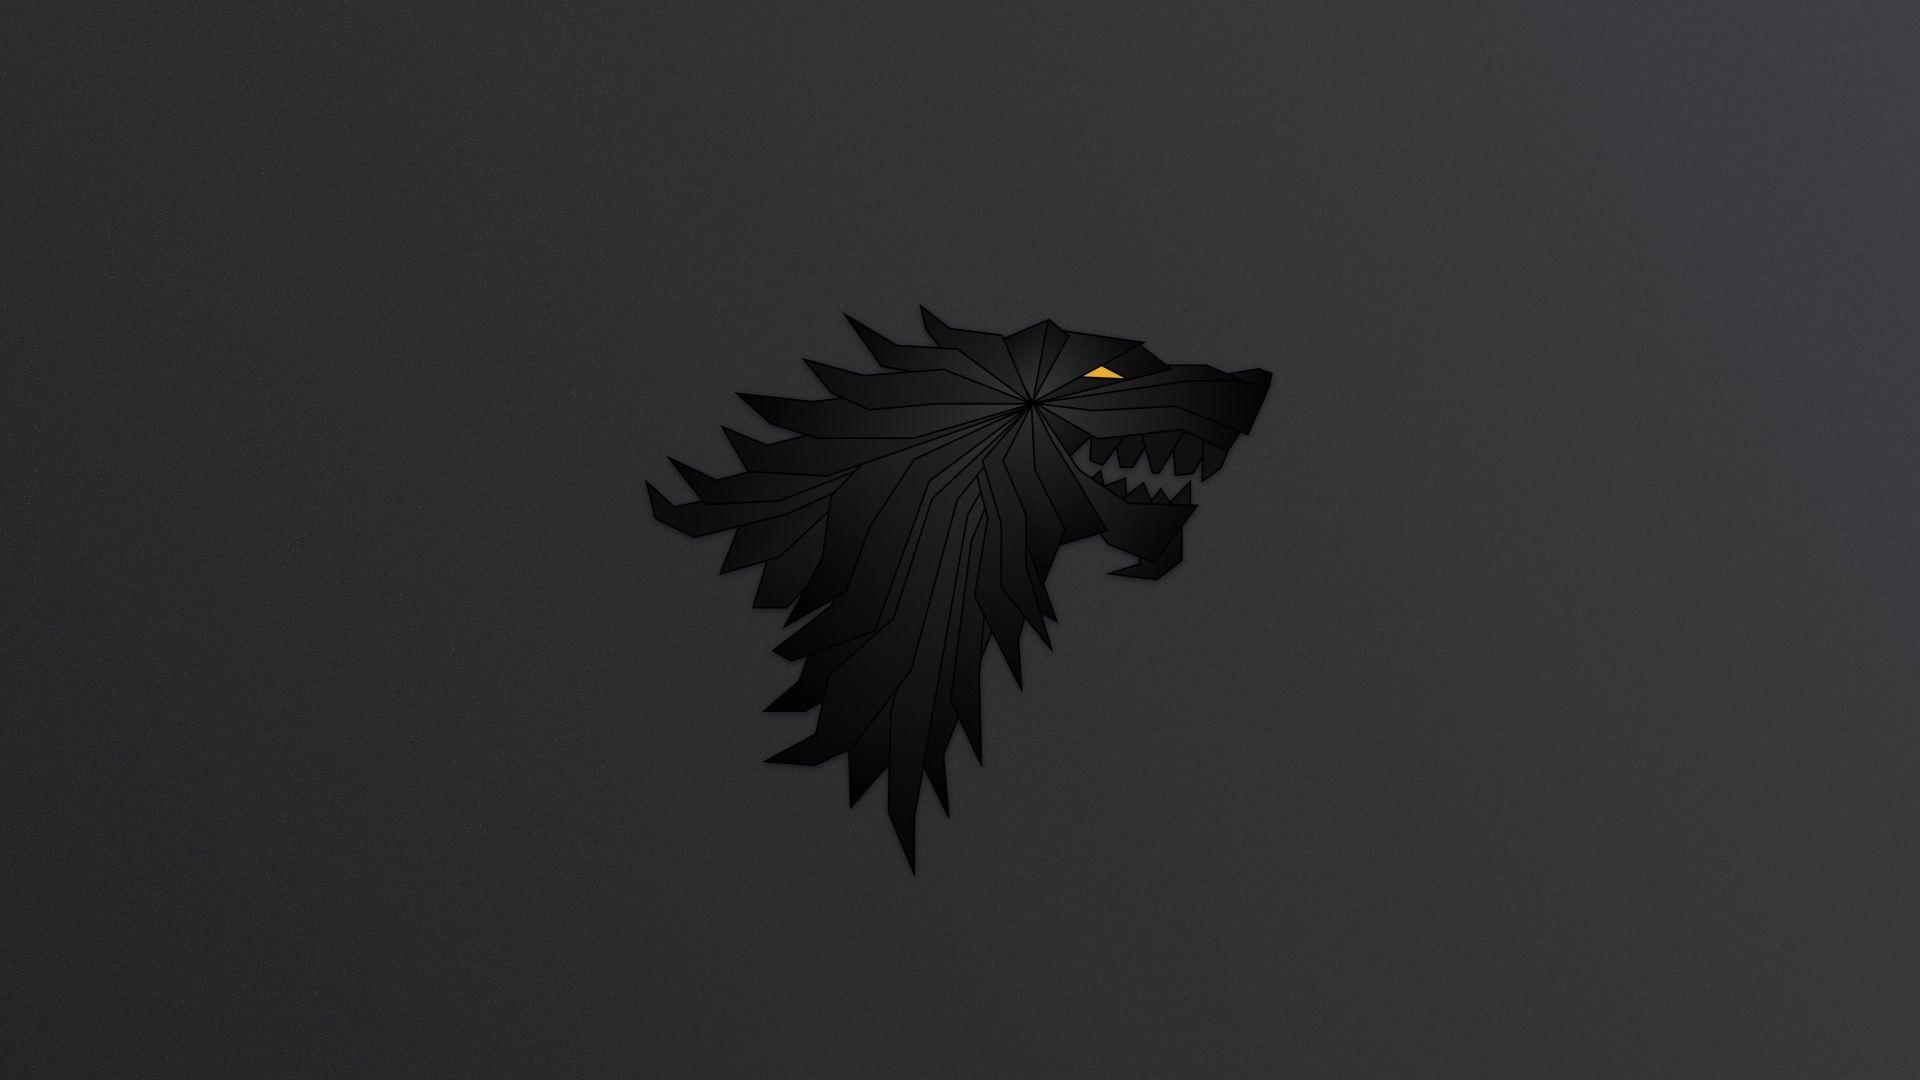 Game of Thrones Dark Art Sigil House Stark